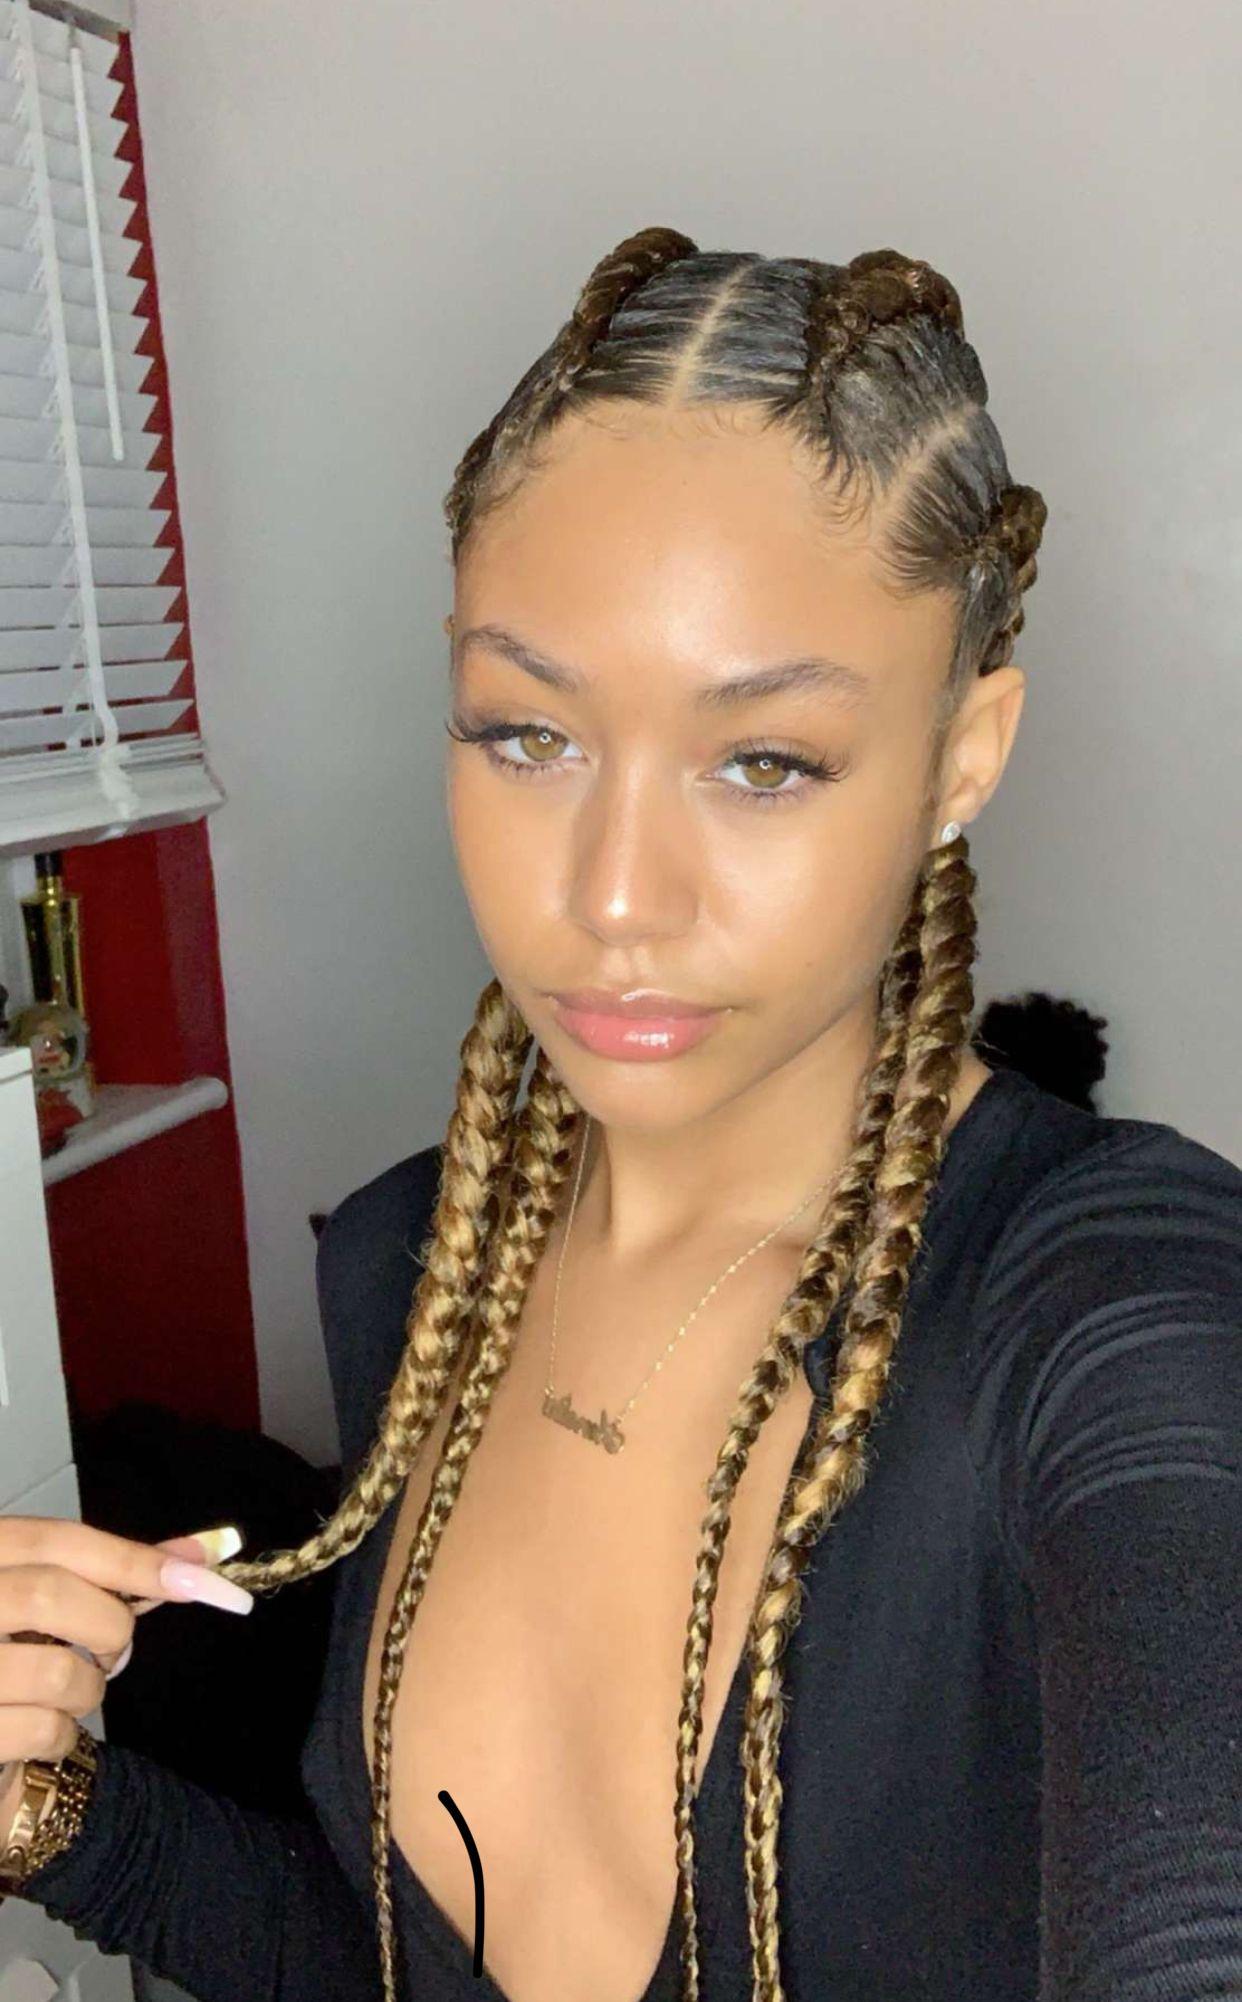 Pinterest Bbygrl ᴀᴍᴇʟɪᴀ In 2019 French Braids